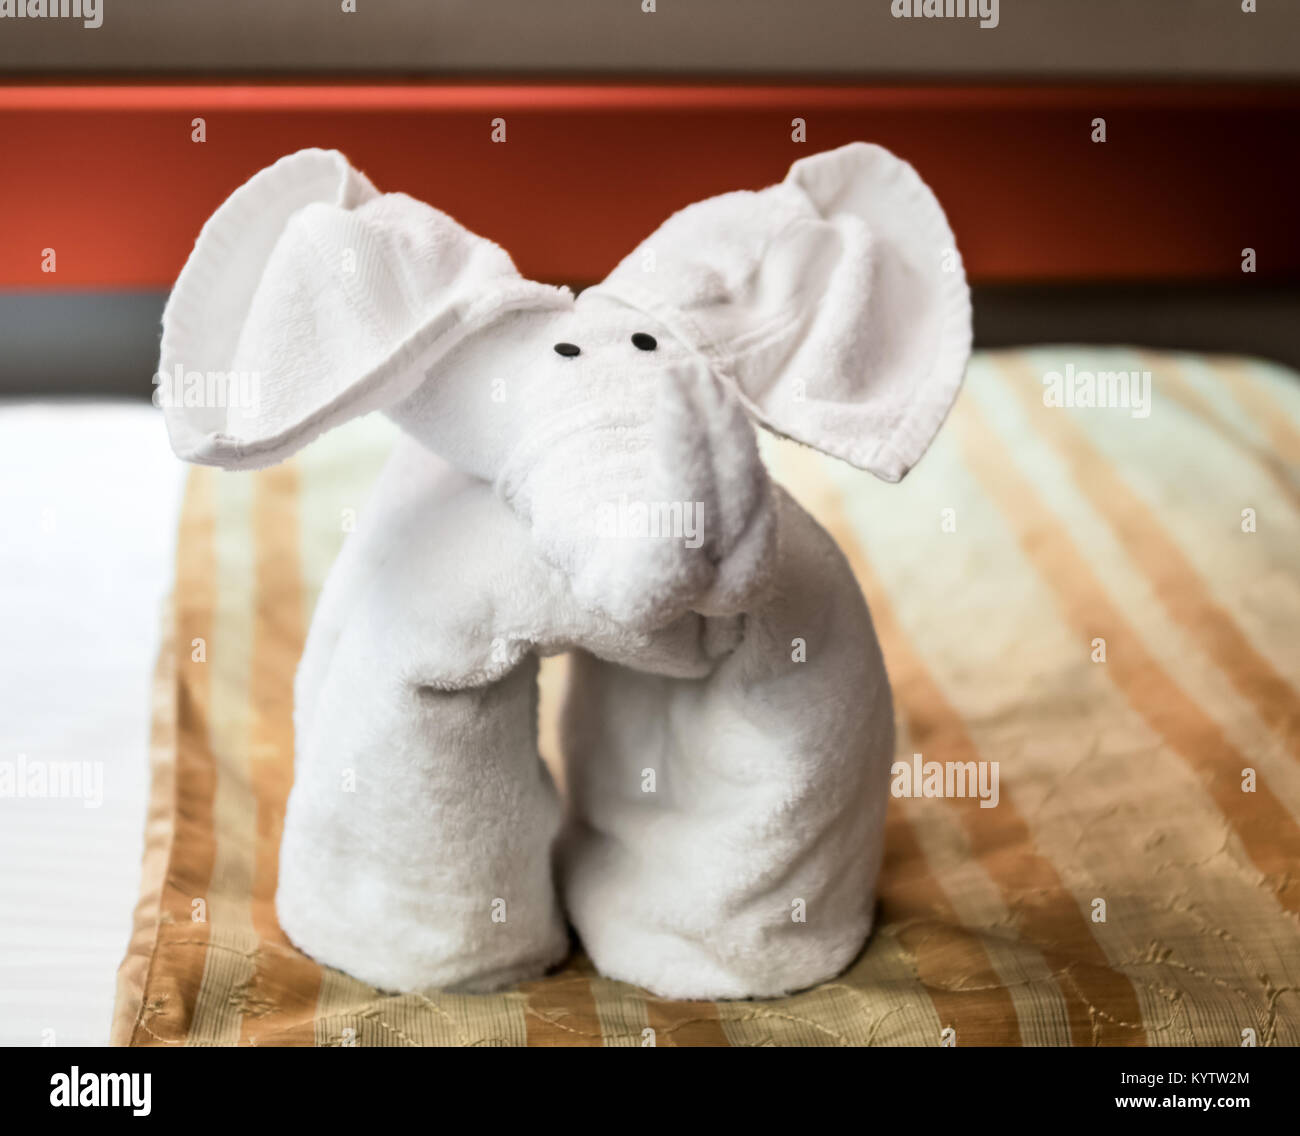 Folded Towel Animal Elephant Forward Face Stock Photo Alamy